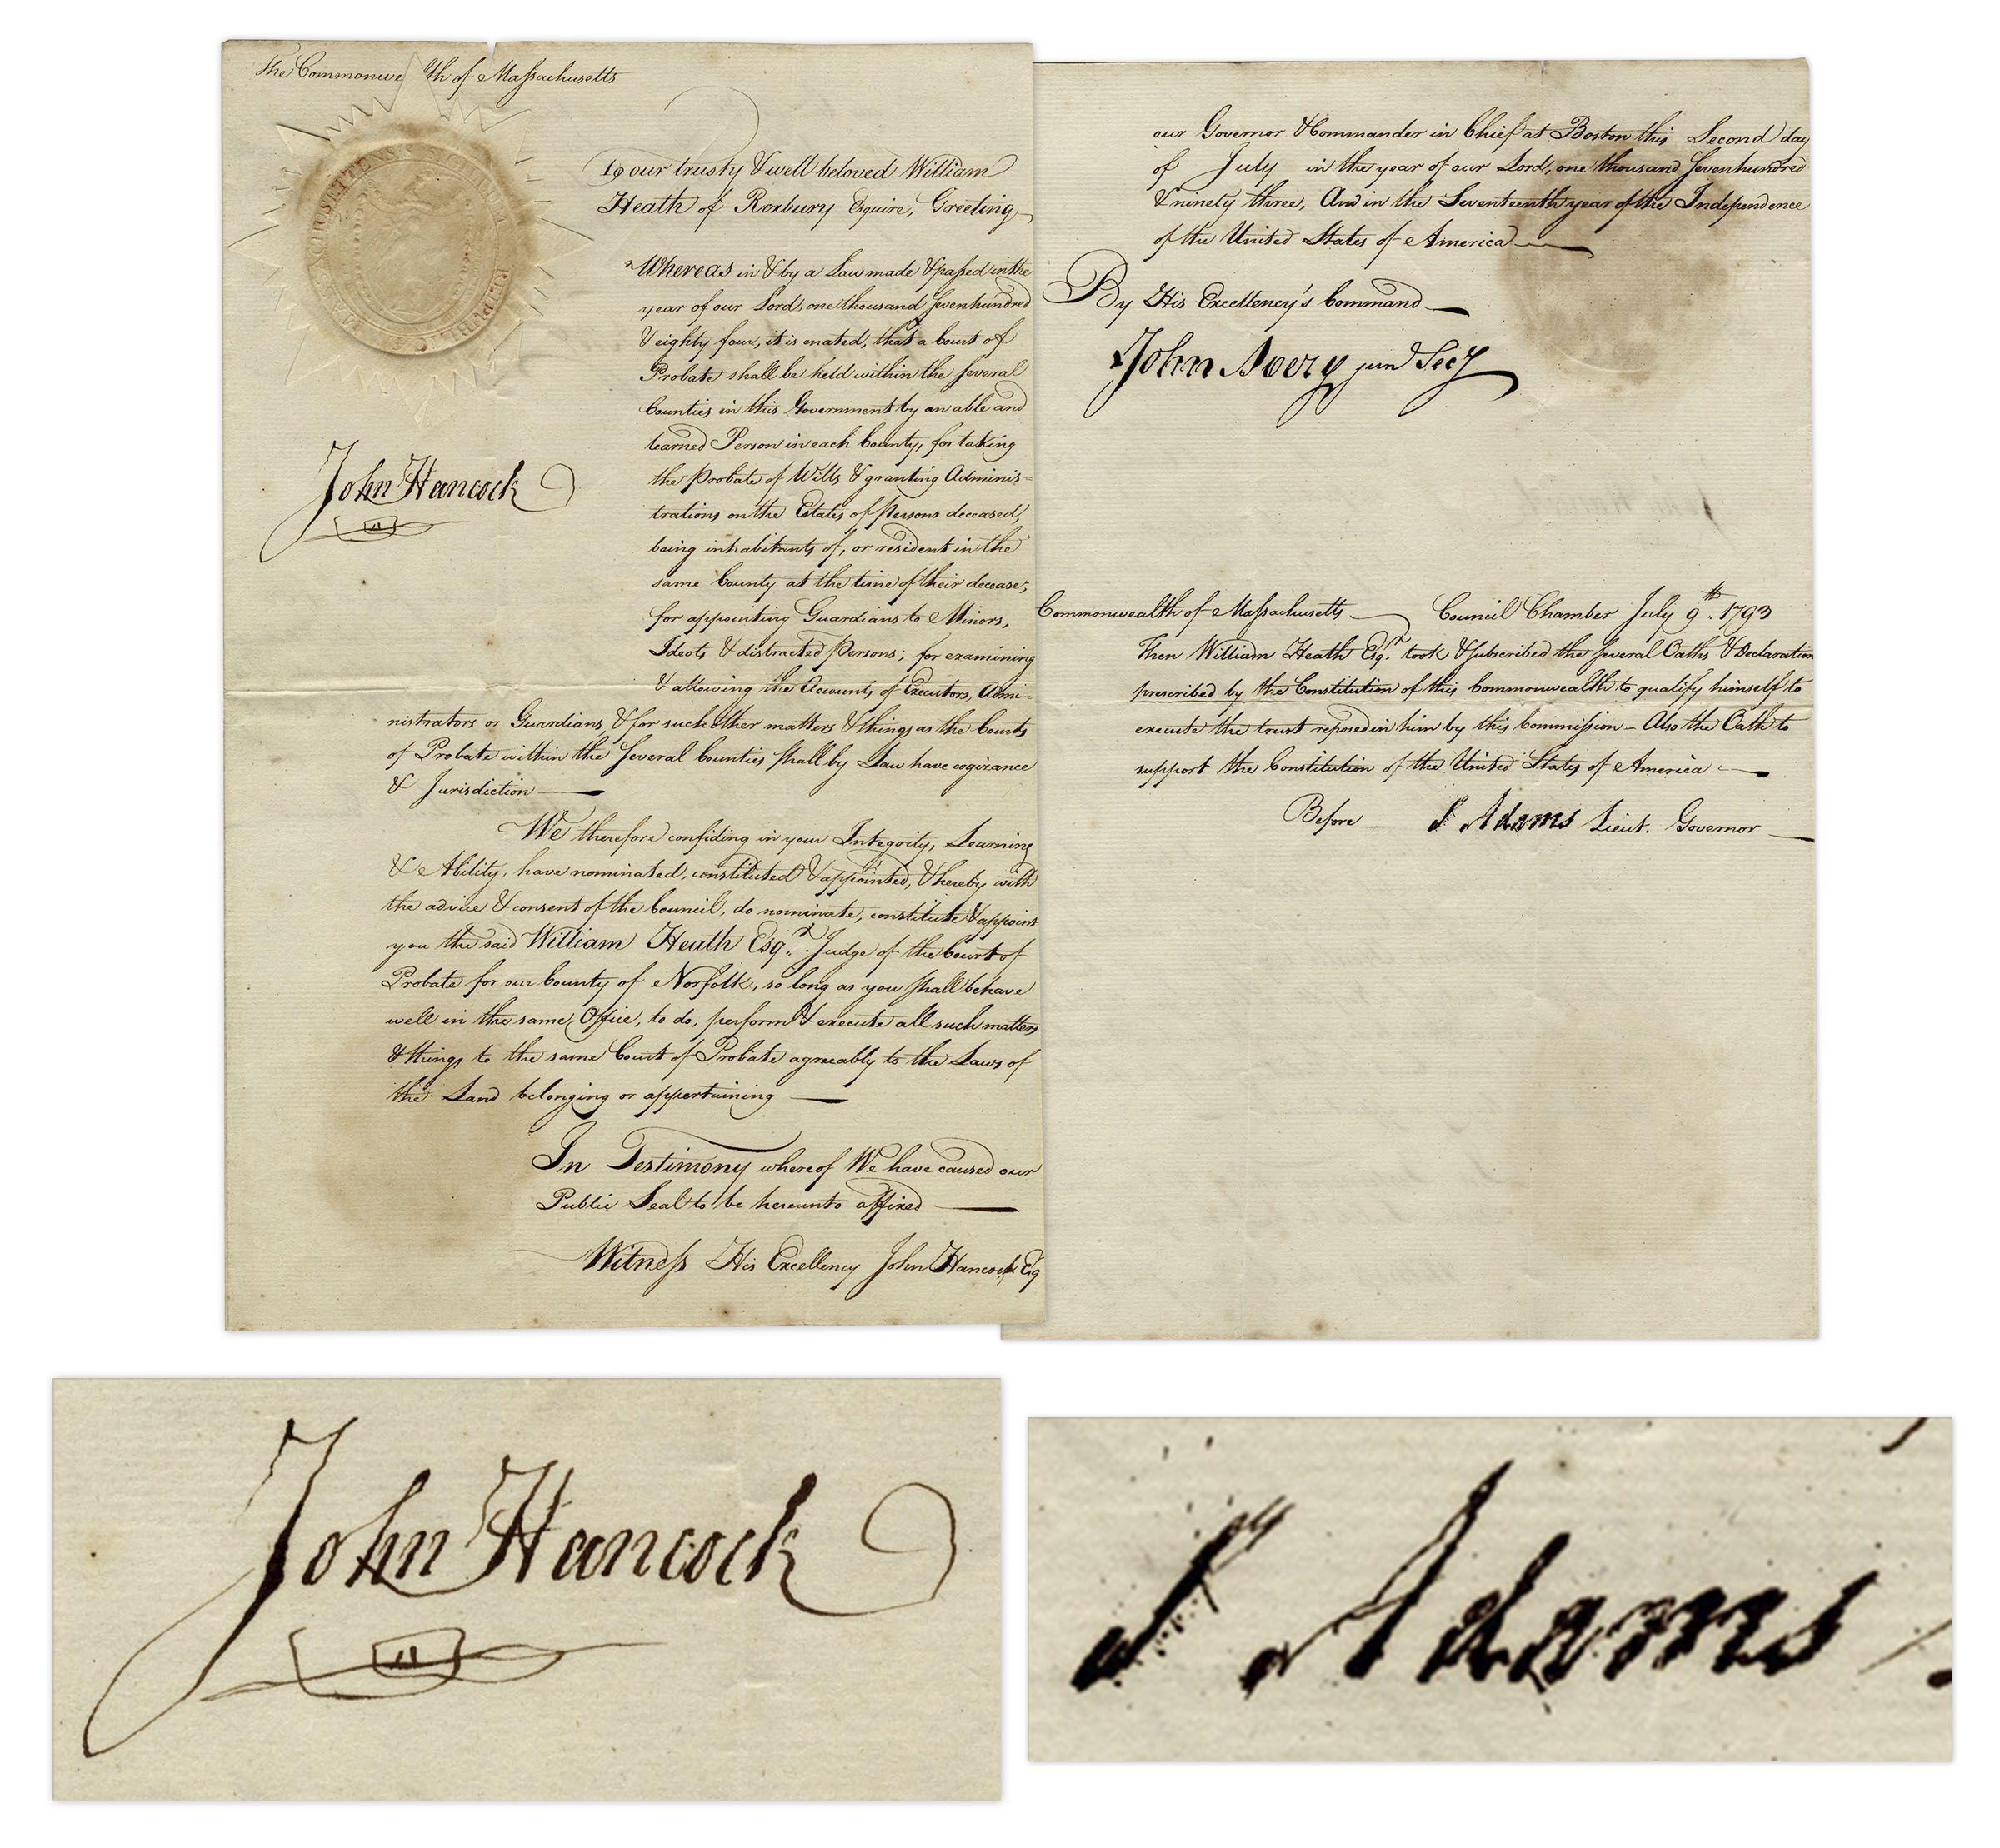 John Hancock Autograph John Hancock & Samuel Adams Signed Judicial Appointment From 1793